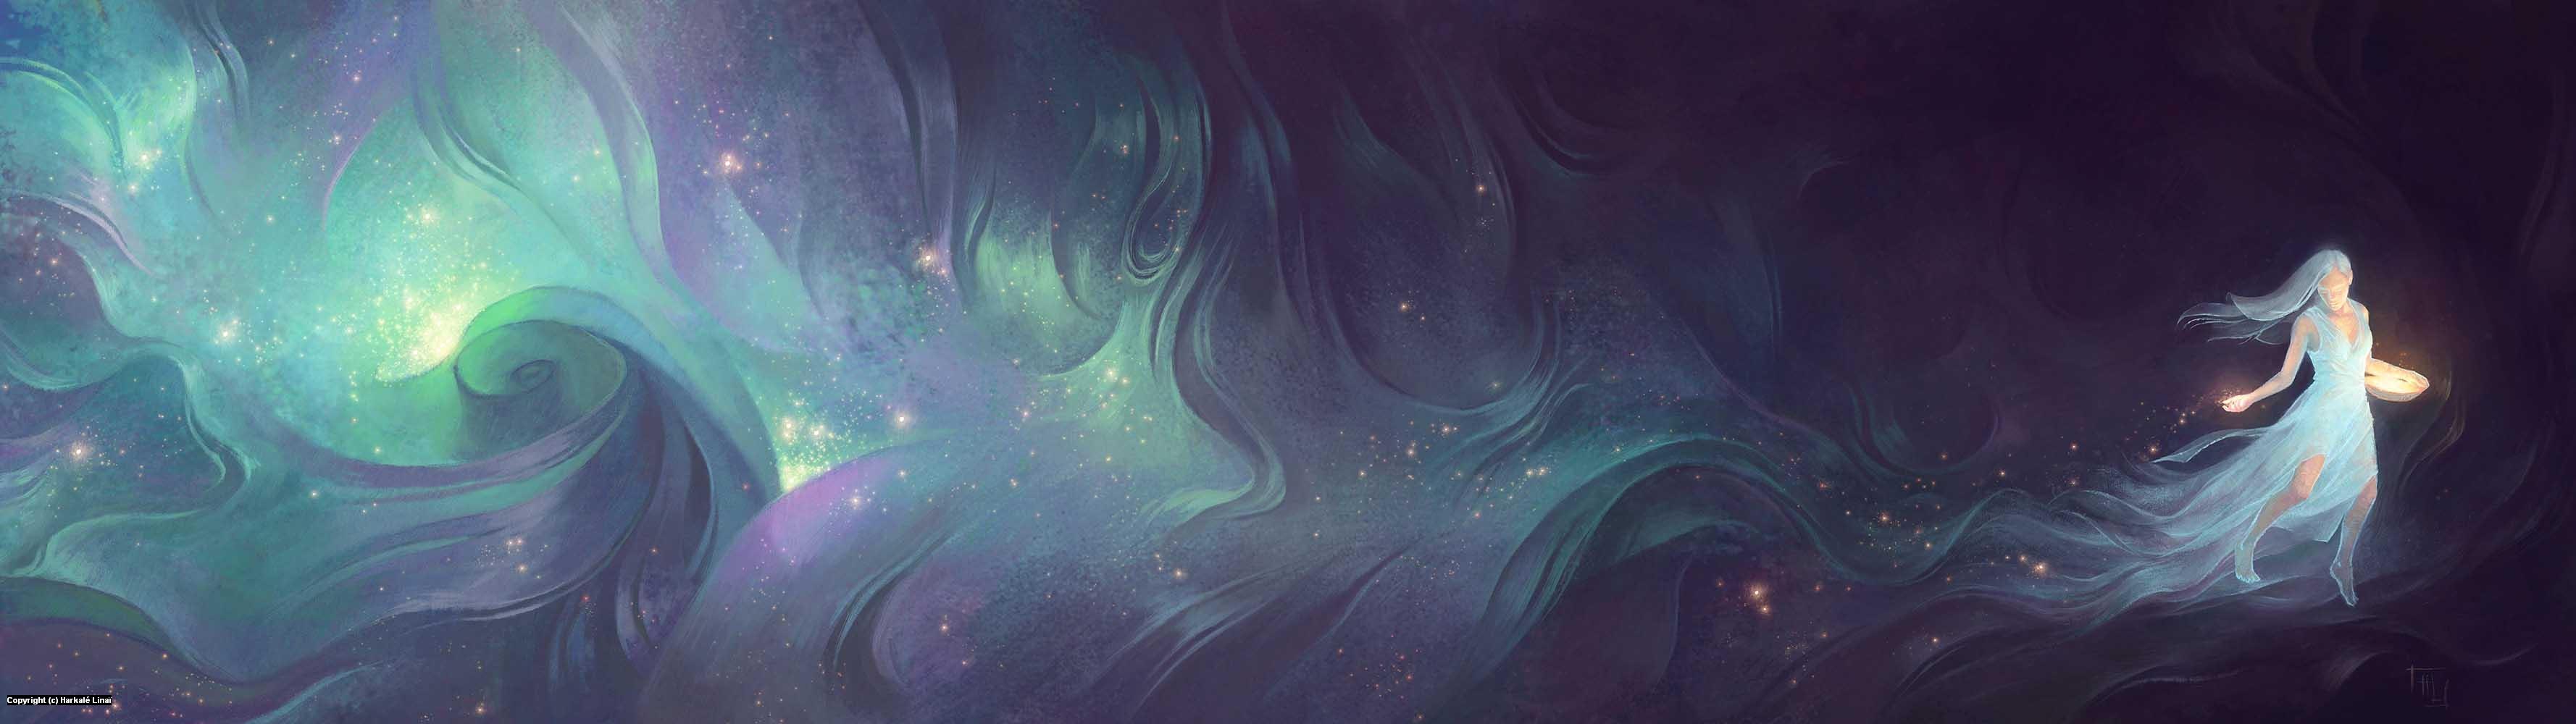 The Star Sower Artwork by Harkalé Linaï